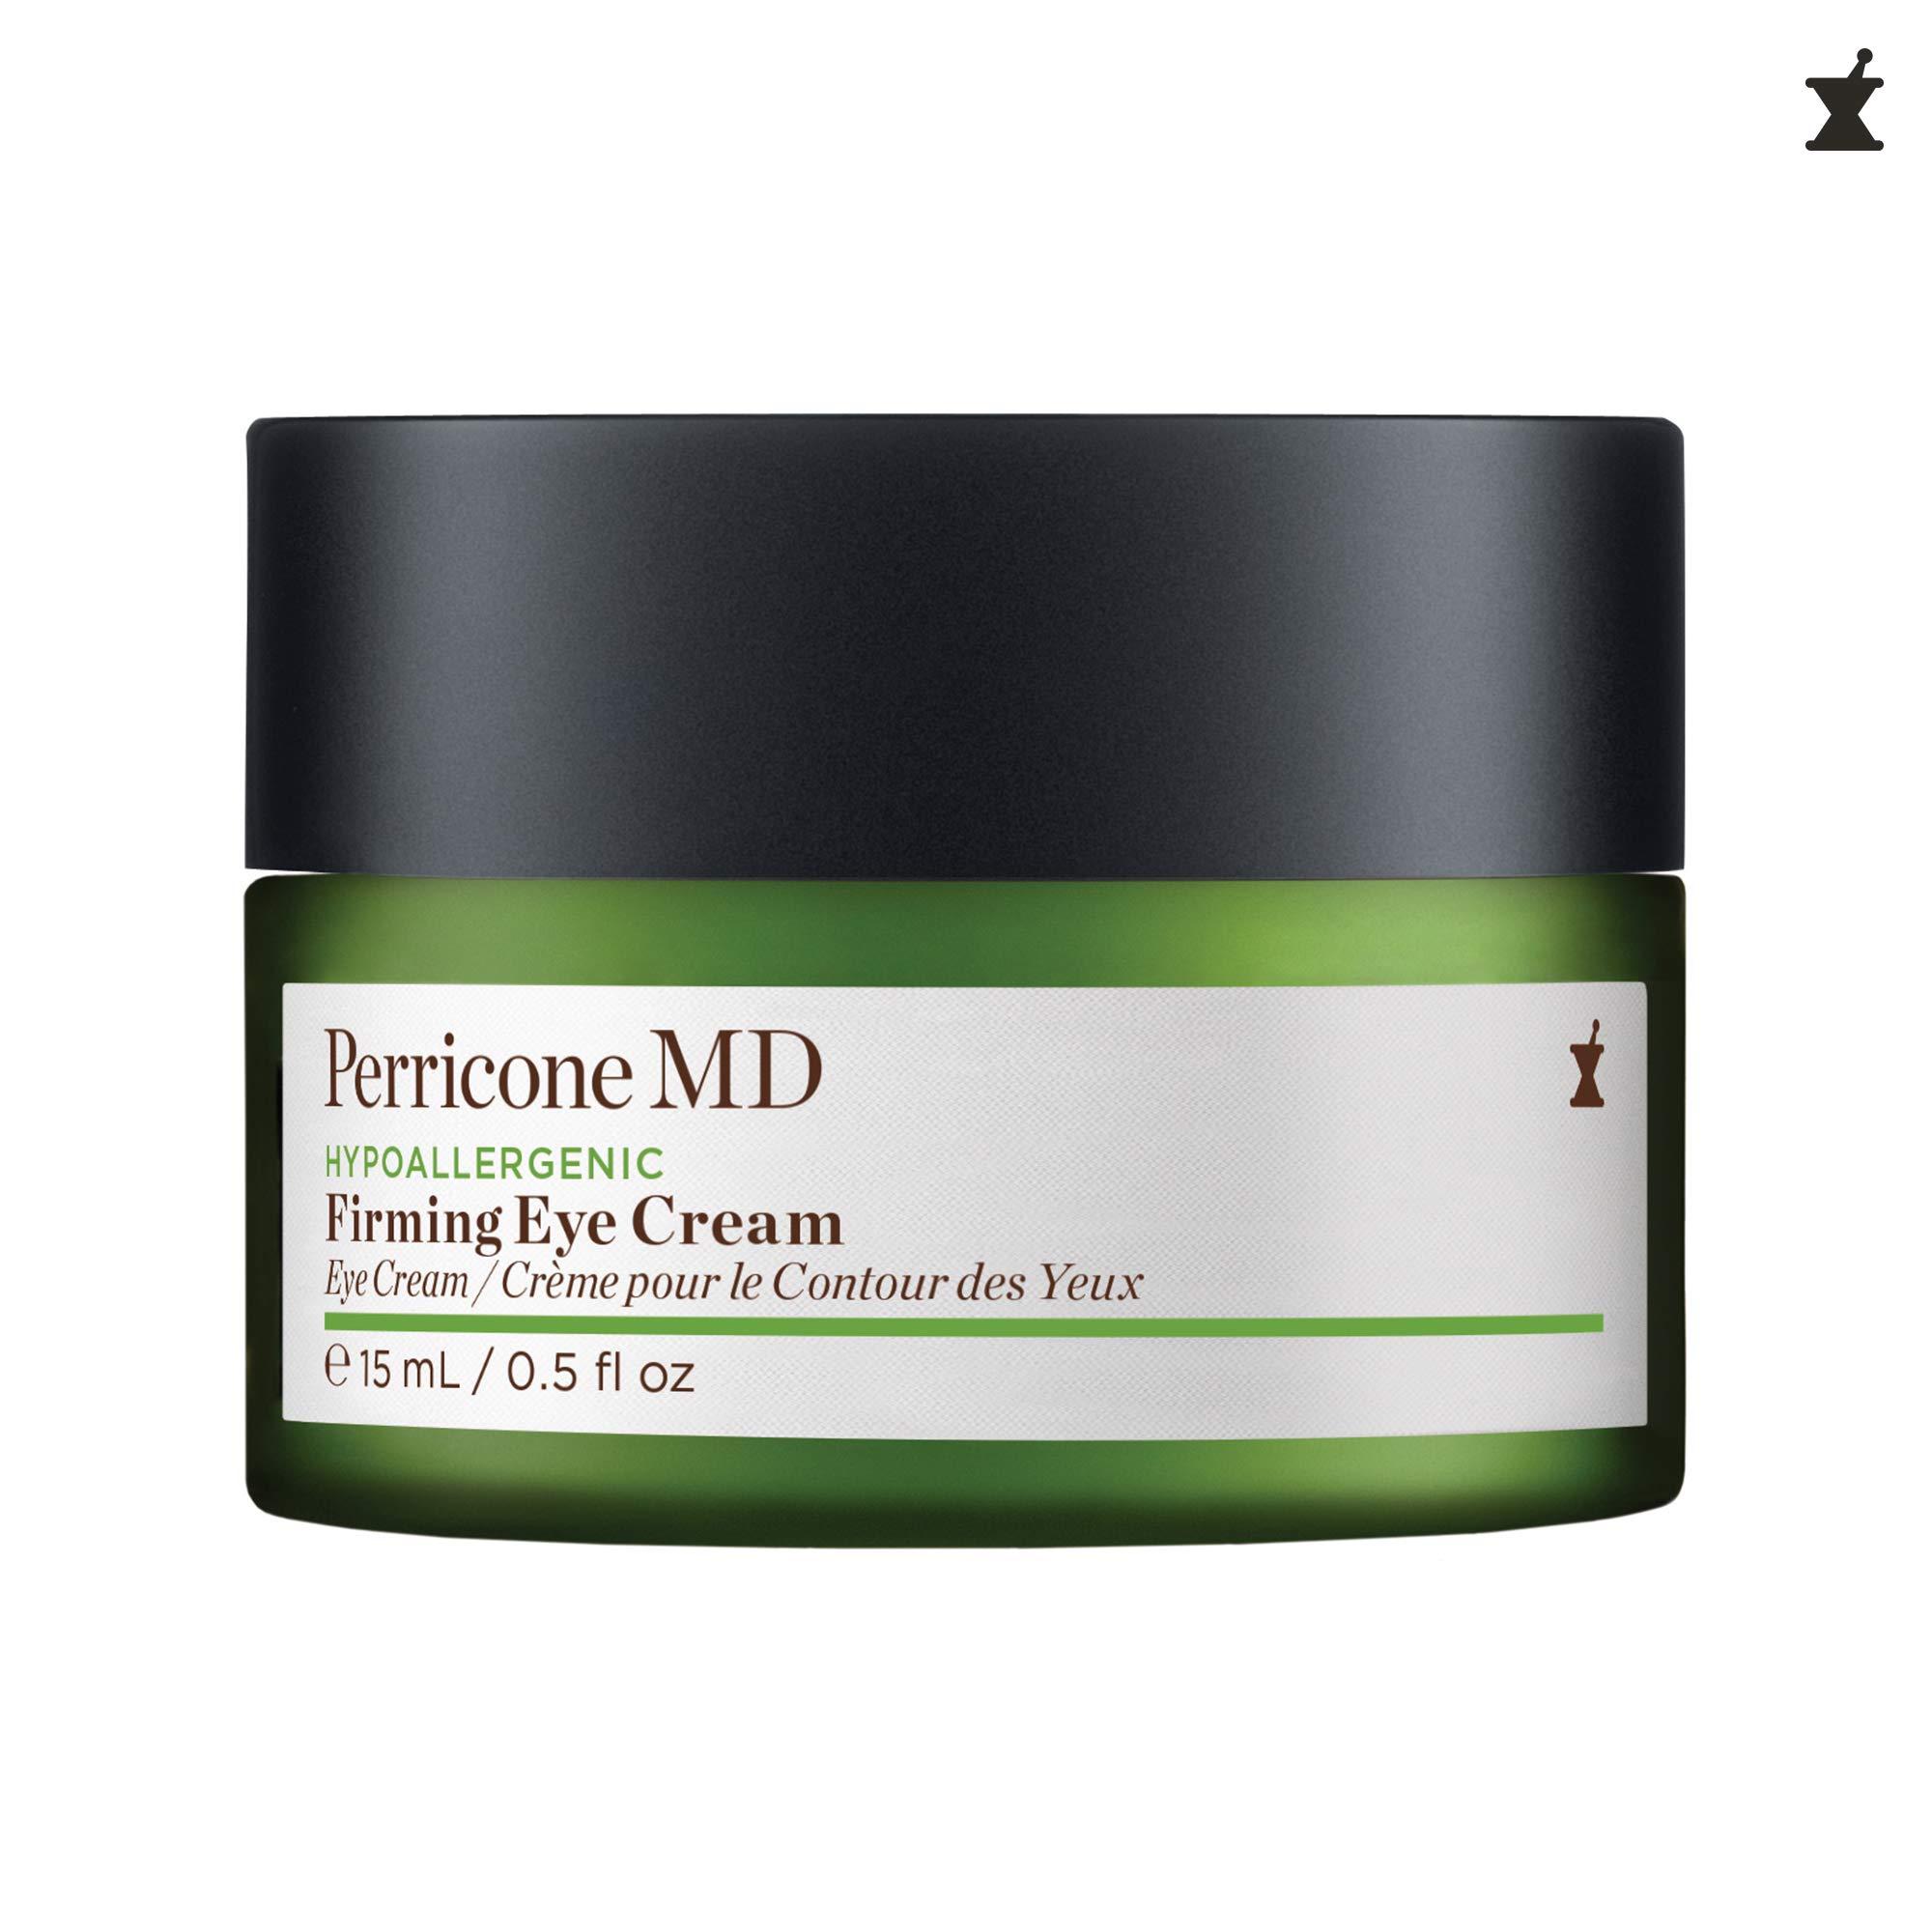 Perricone M.D. - Hypoallergenic Firming Eye Cream